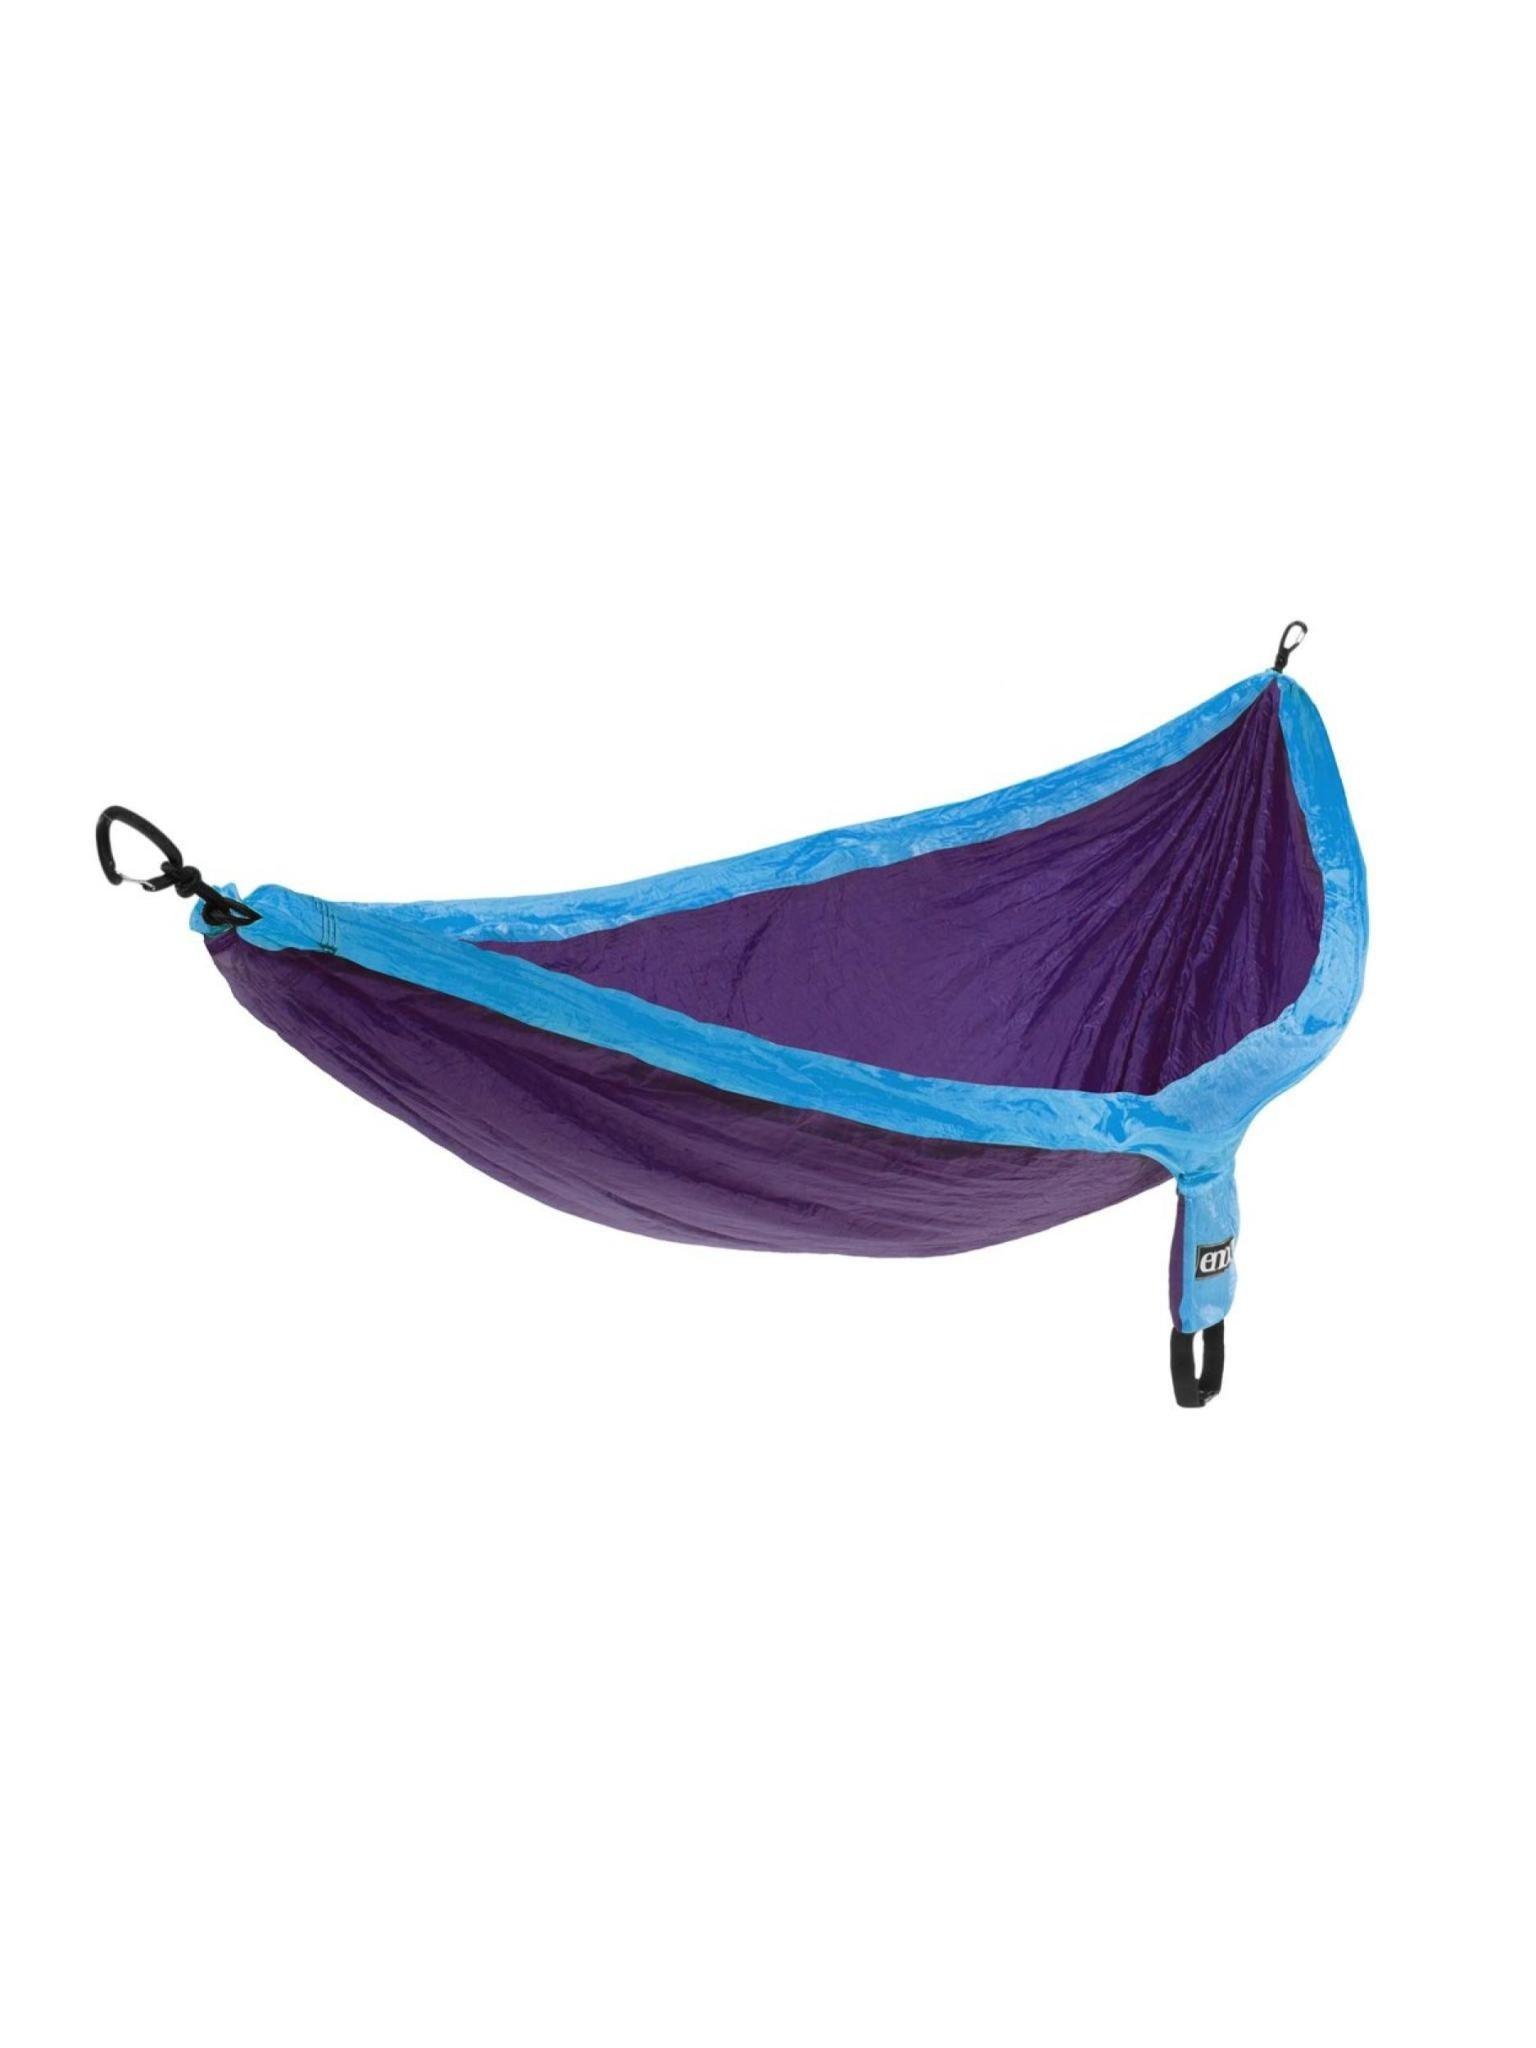 ENO SingleNest Hammock Purple/Teal